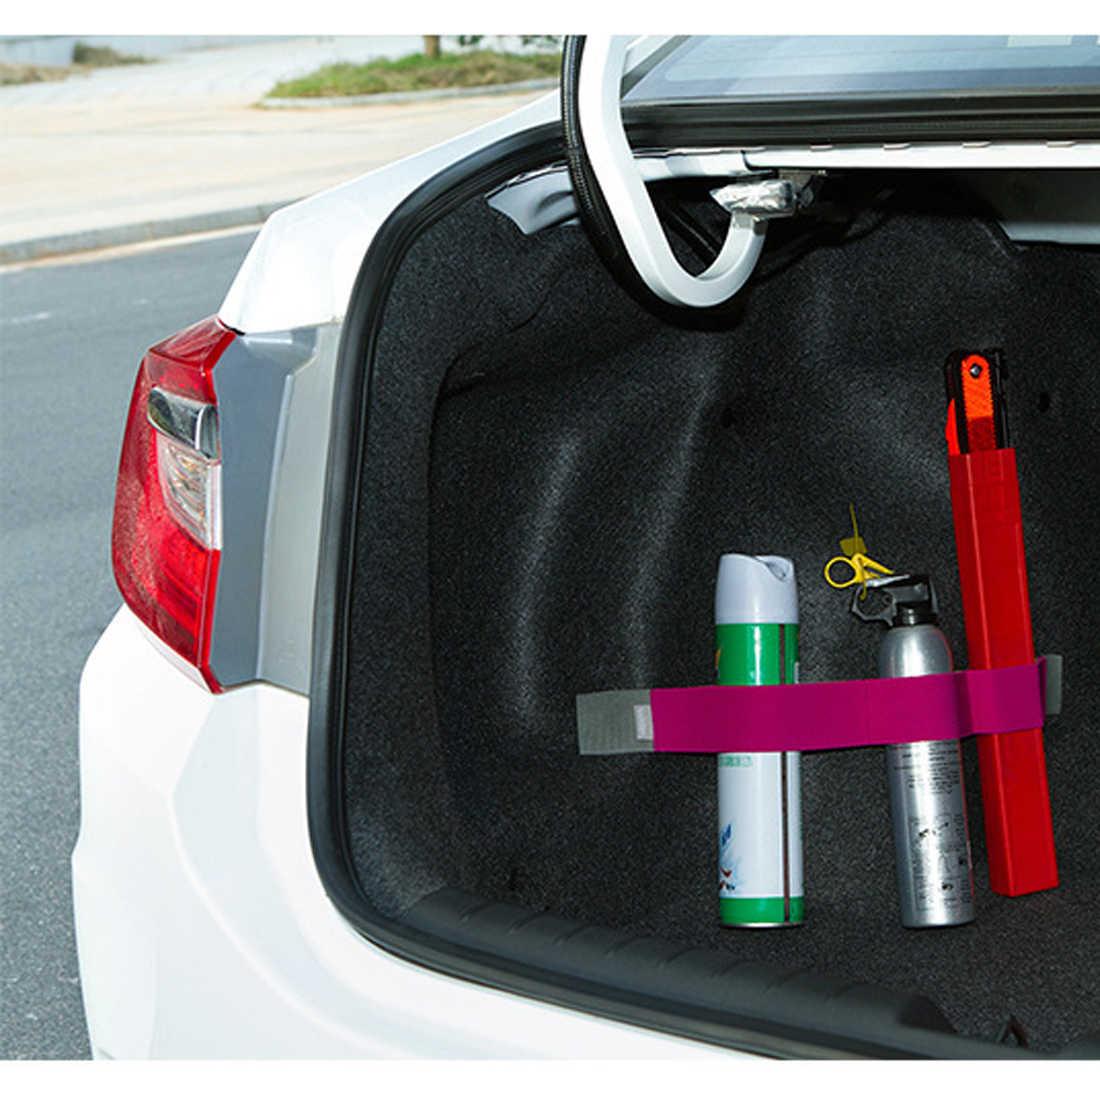 Promoção Organizador Mala Do Carro Carro-styling Cor Cinta Elástica Fixo Diversos Estiva Tidying Acessórios Interiores Auto Dewtreetali